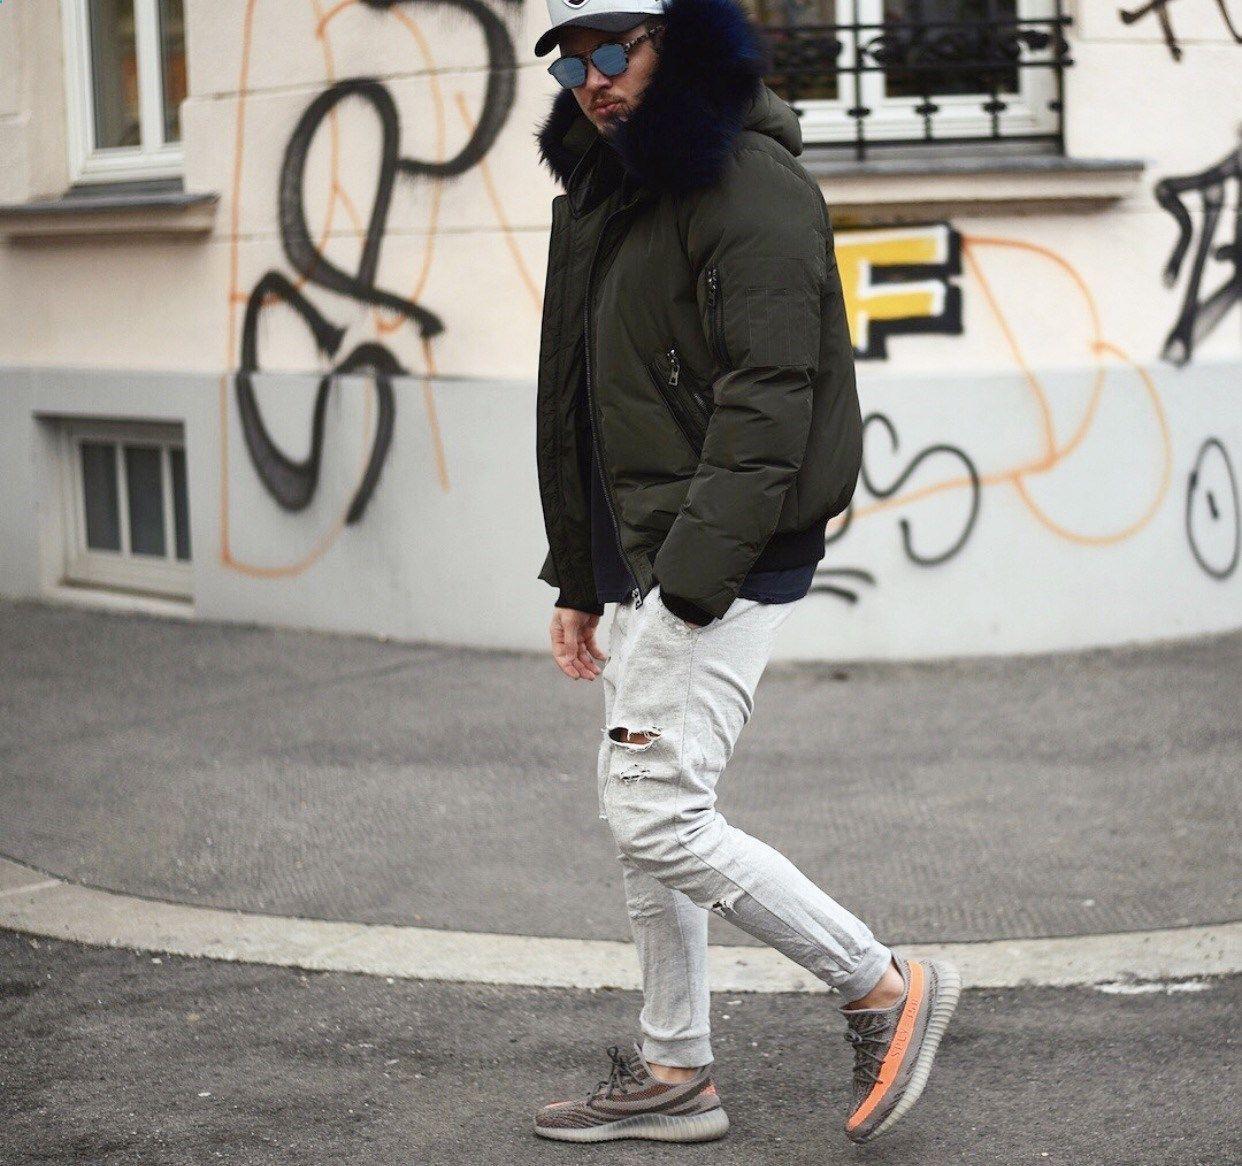 Feat Adidas Yeezy Boost 350 V2, Beluga.